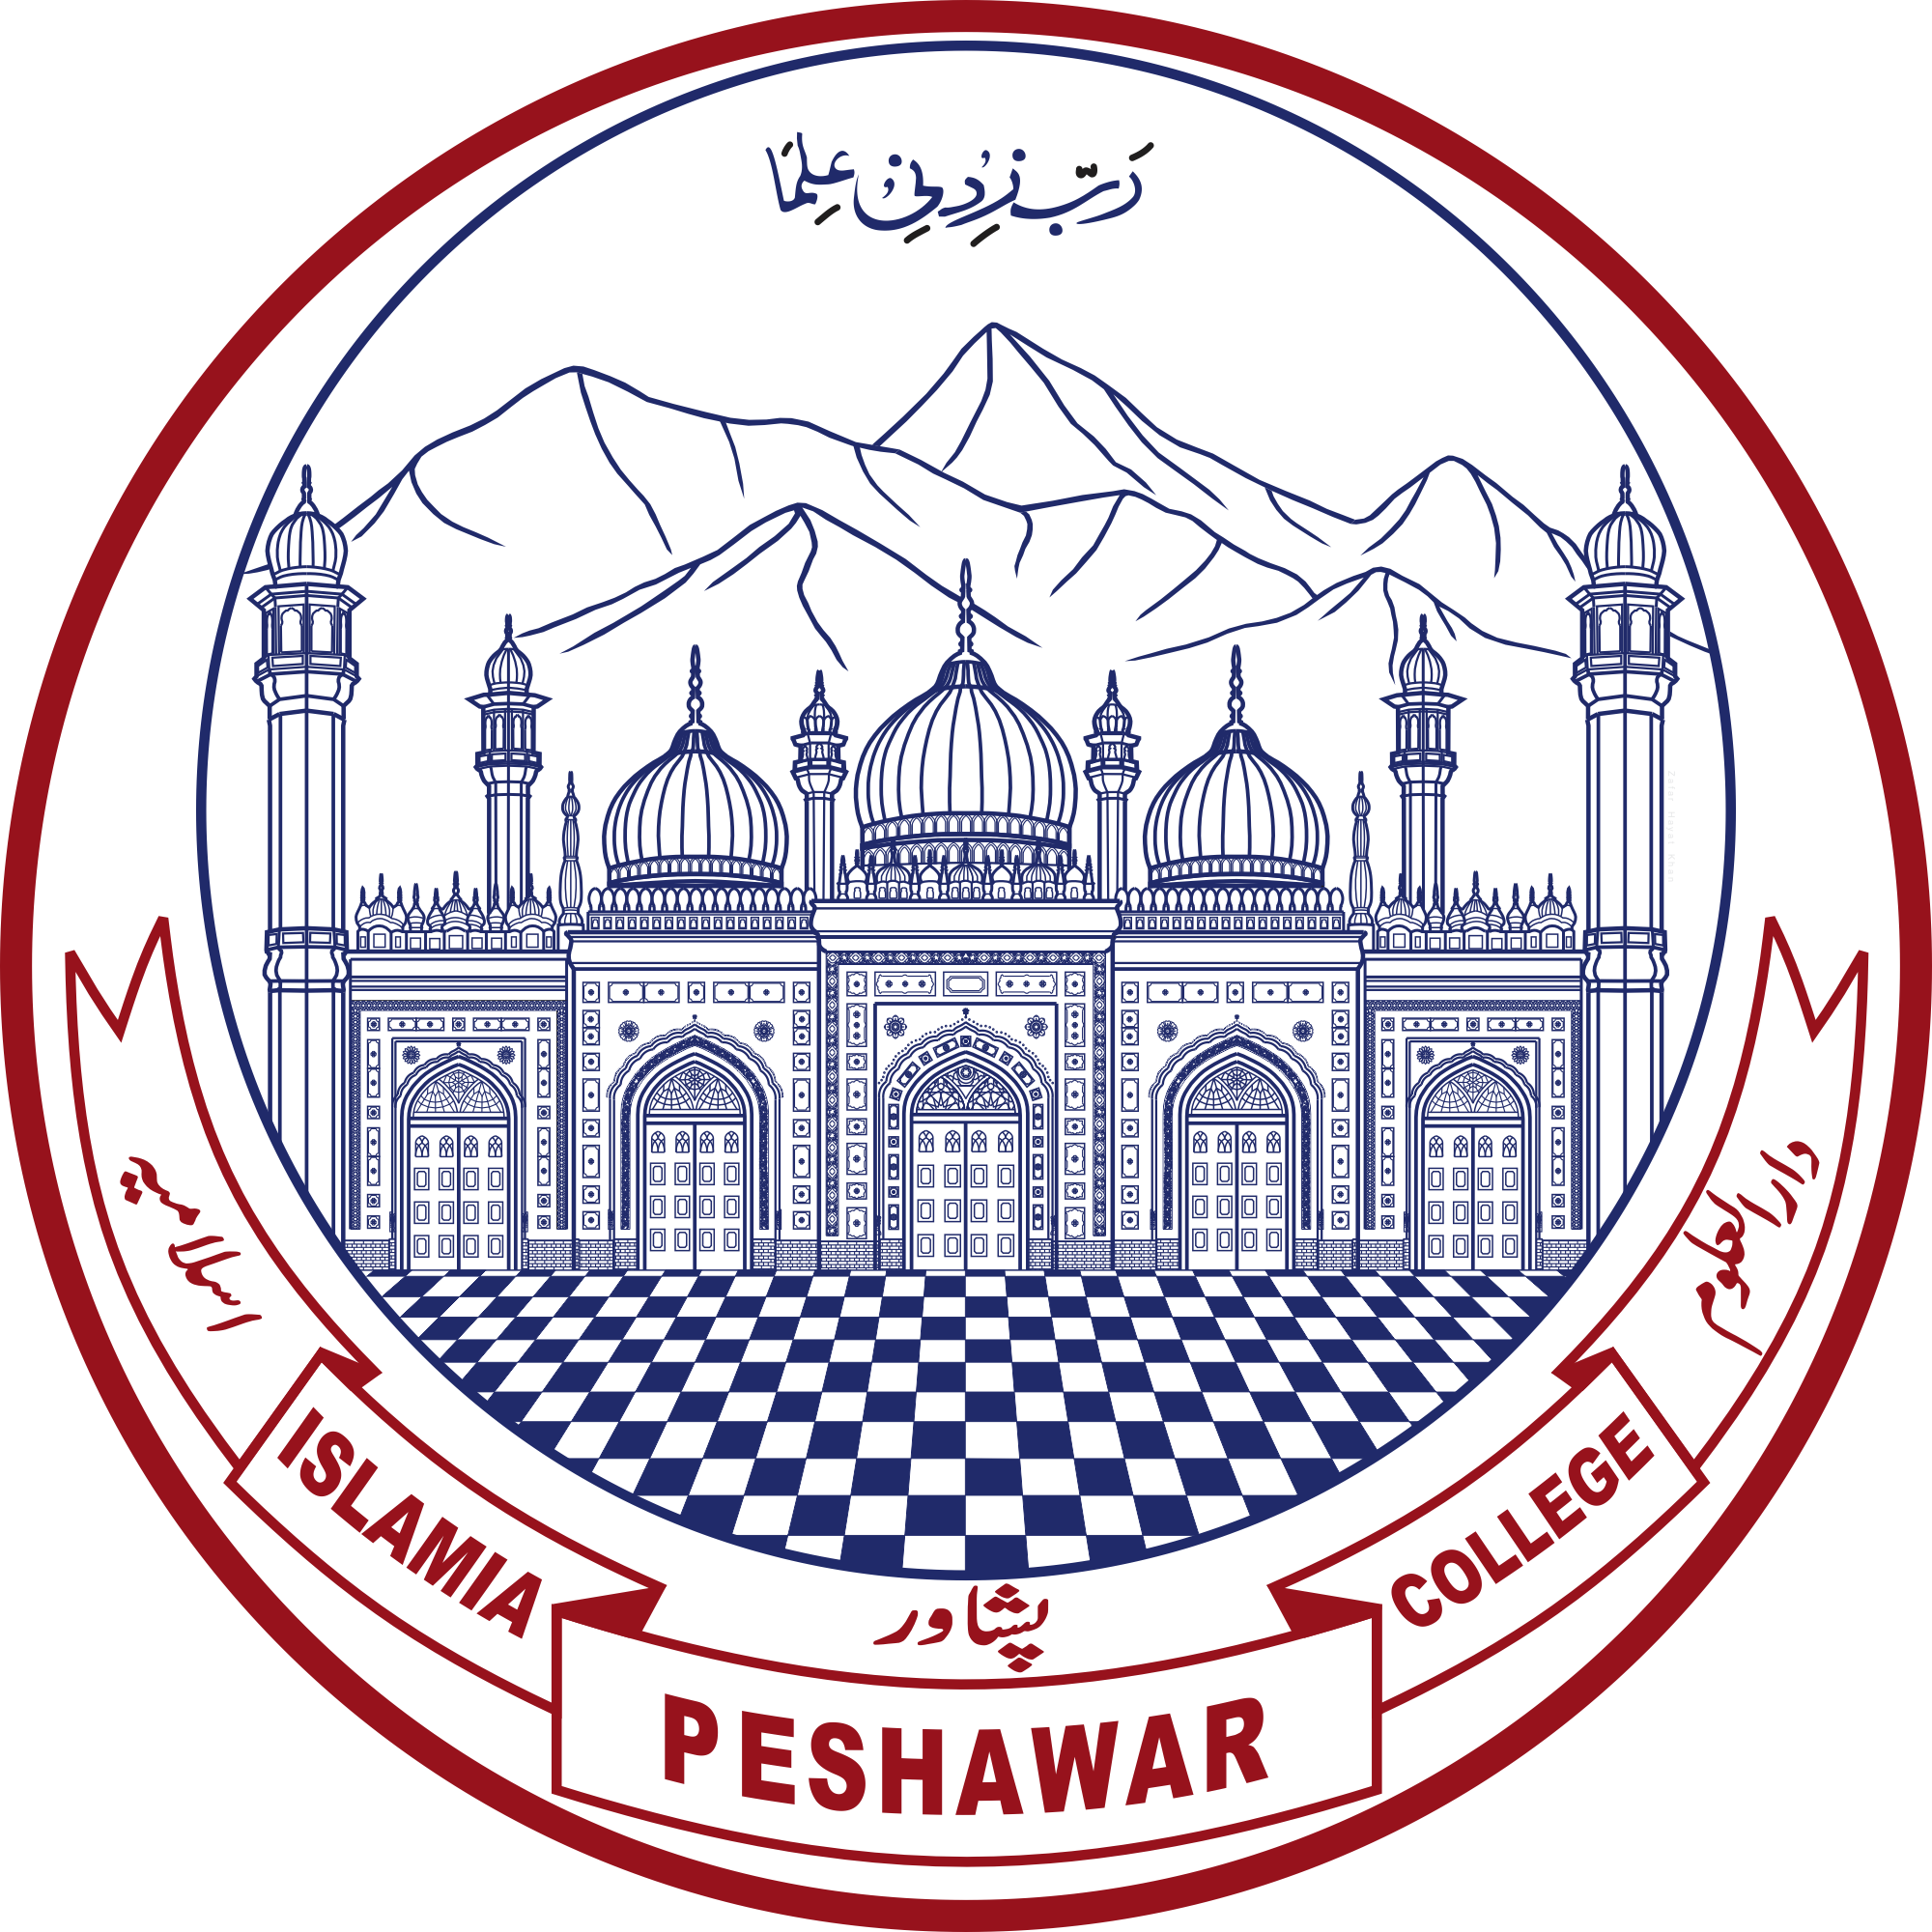 Islamia College Peshawar M.Phil & PhD entry test result 2021